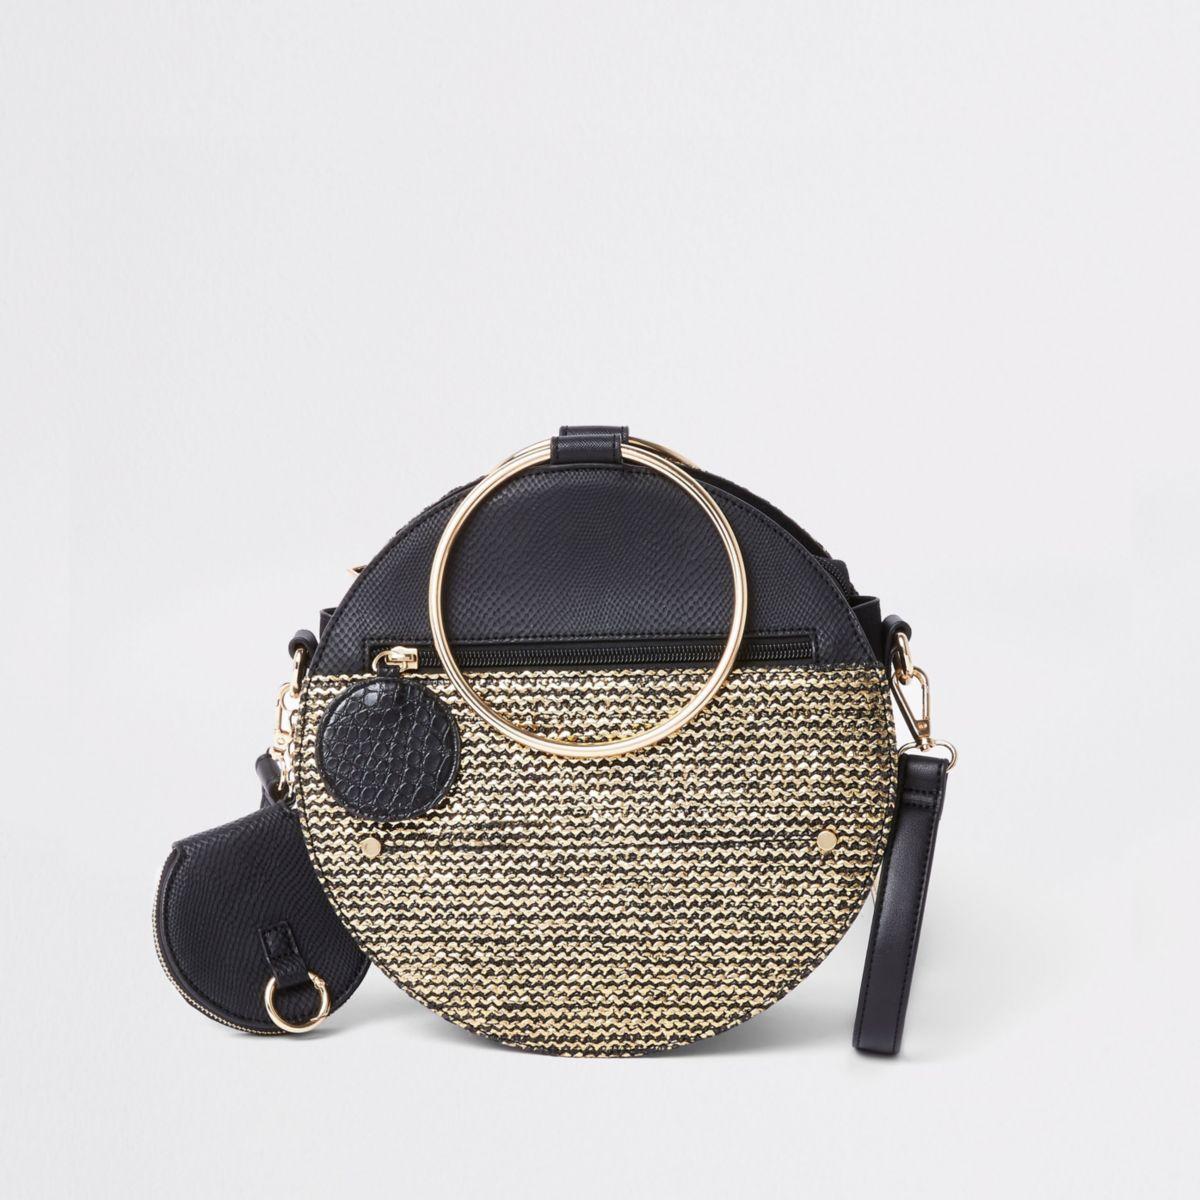 Black gold tone handle round cross body bag